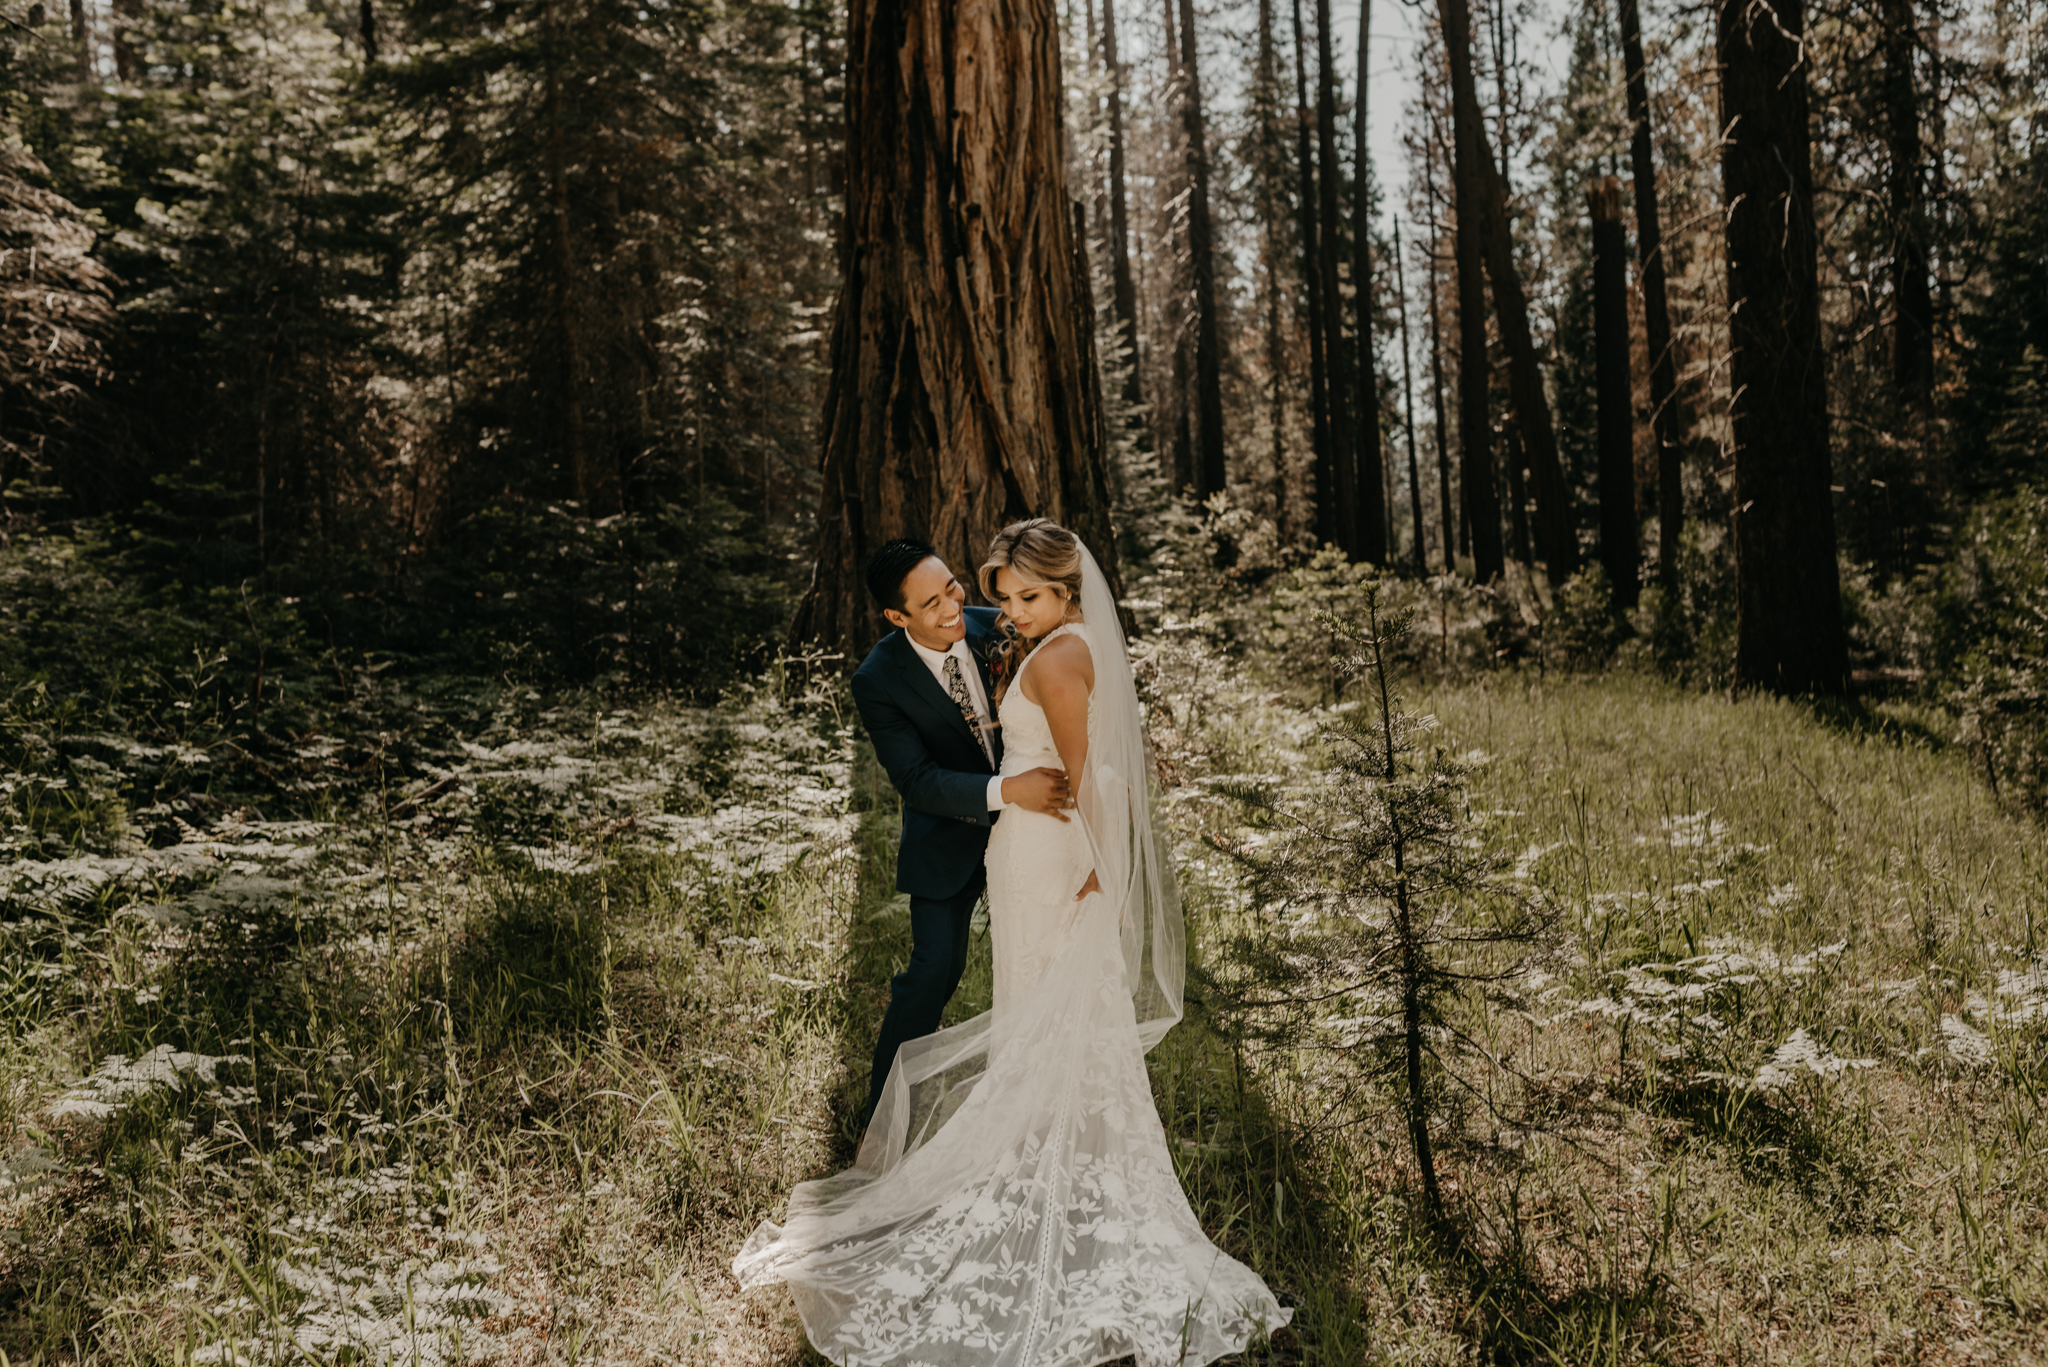 © Isaiah + Taylor Photography - Evergreen Lodge Destination Yoesmite Wedding - Los Angeles Wedding Photographer-144.jpg